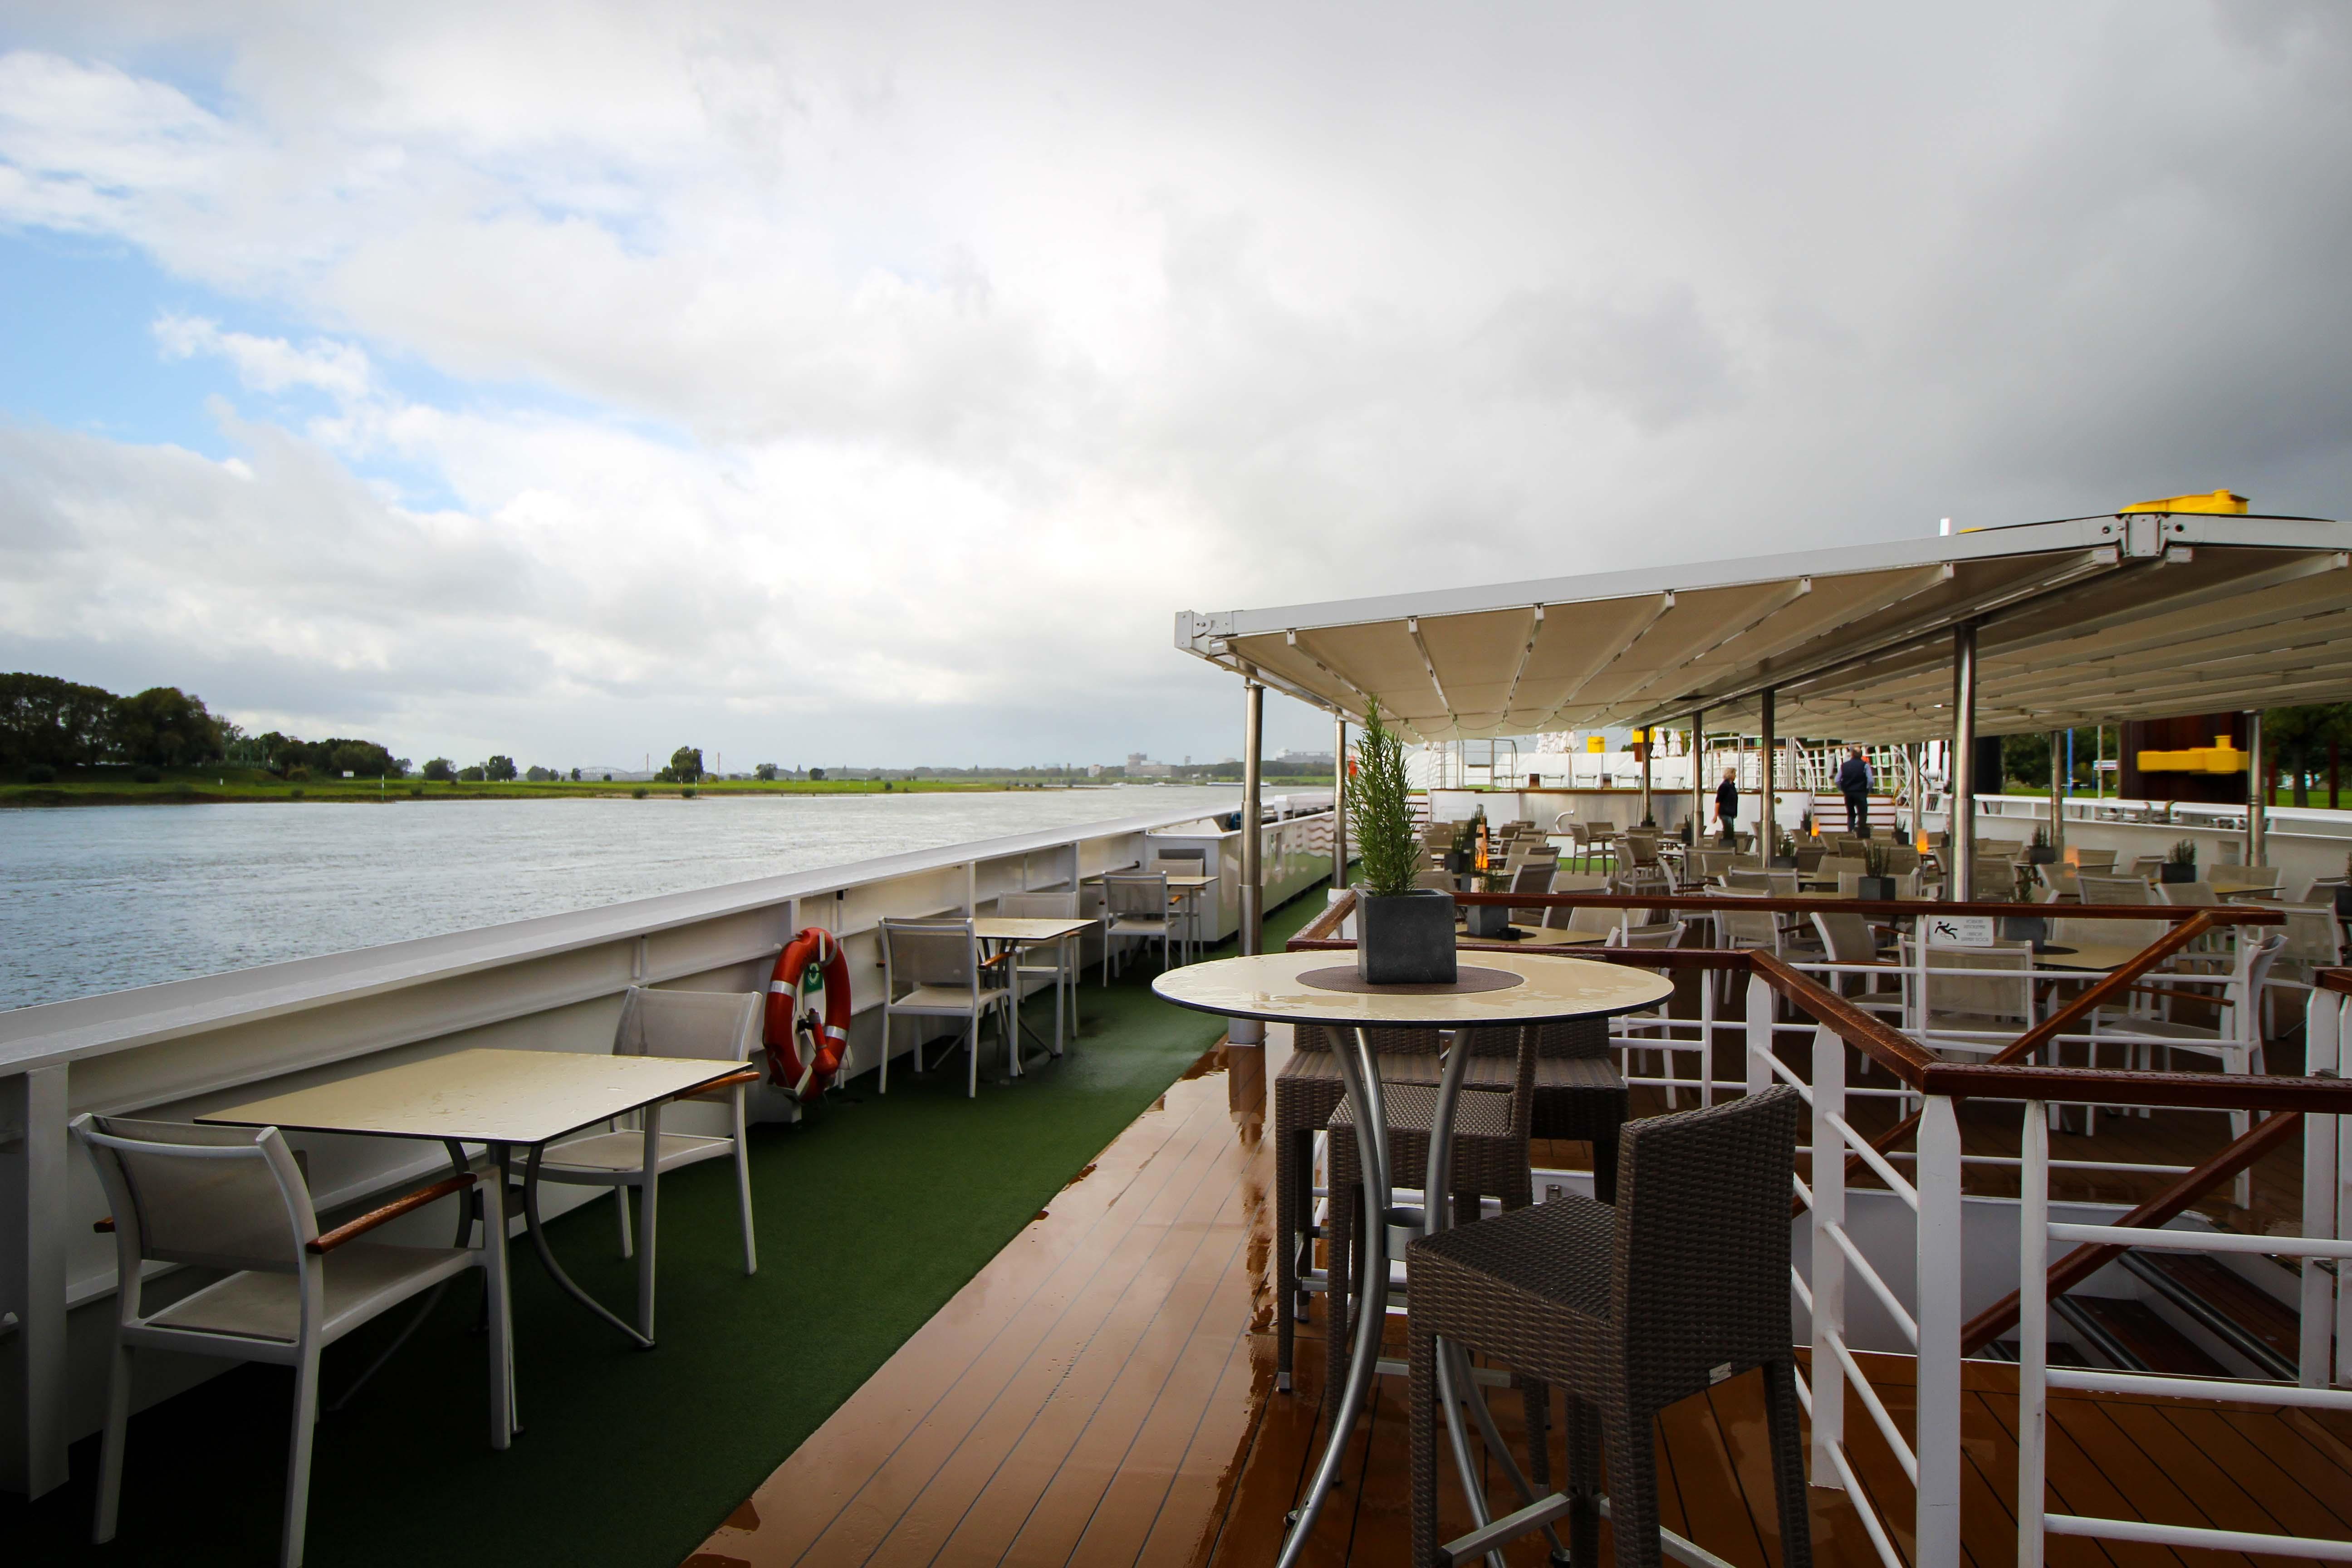 Flusskreuzfahrt A-ROSA SILVA Kreuzfahrtschiff Rhein Erlebnis Kurs Amsterdam Sonnendeck Flusskreuzfahrt Reiseblog